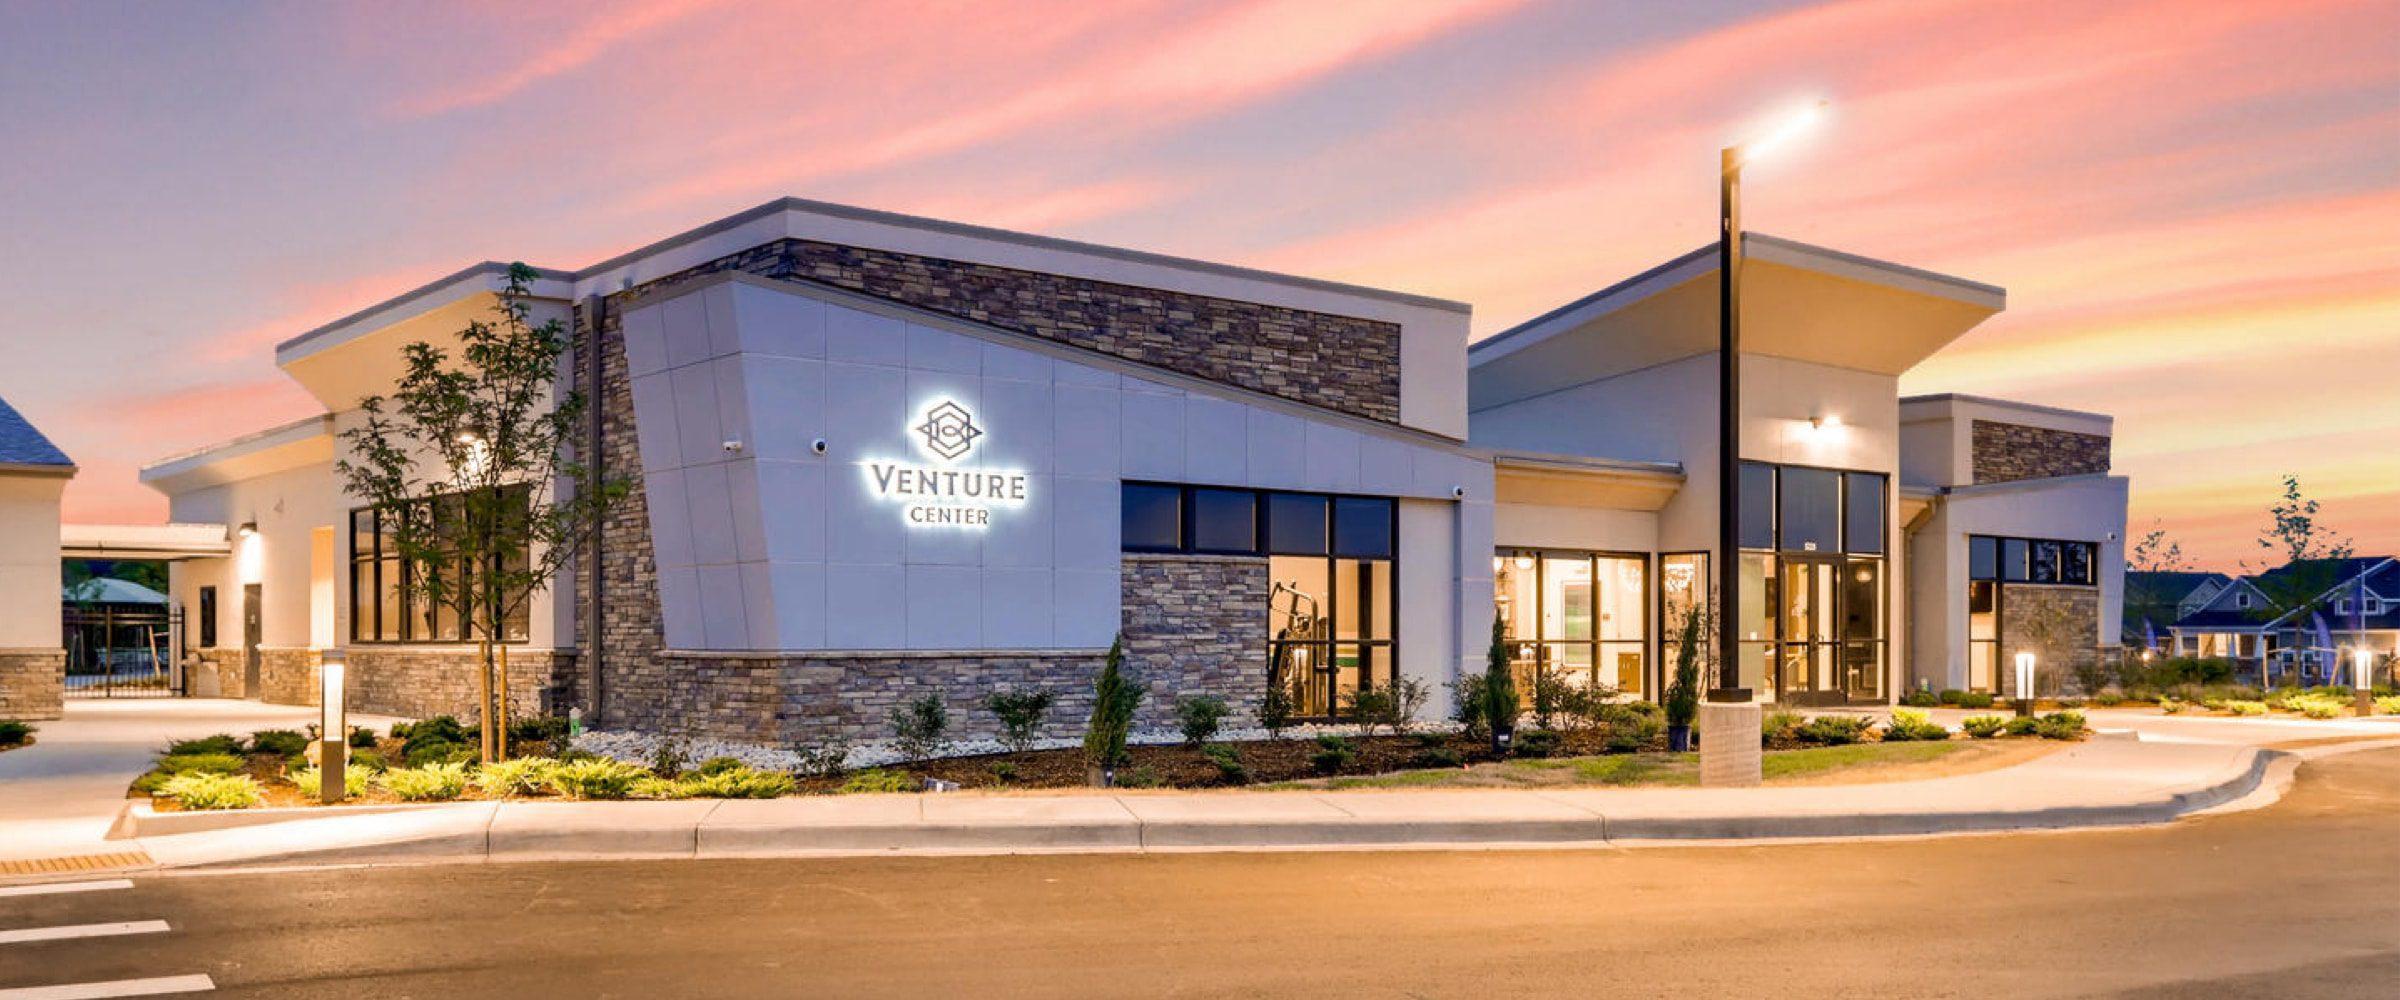 Venture Center & Water Park